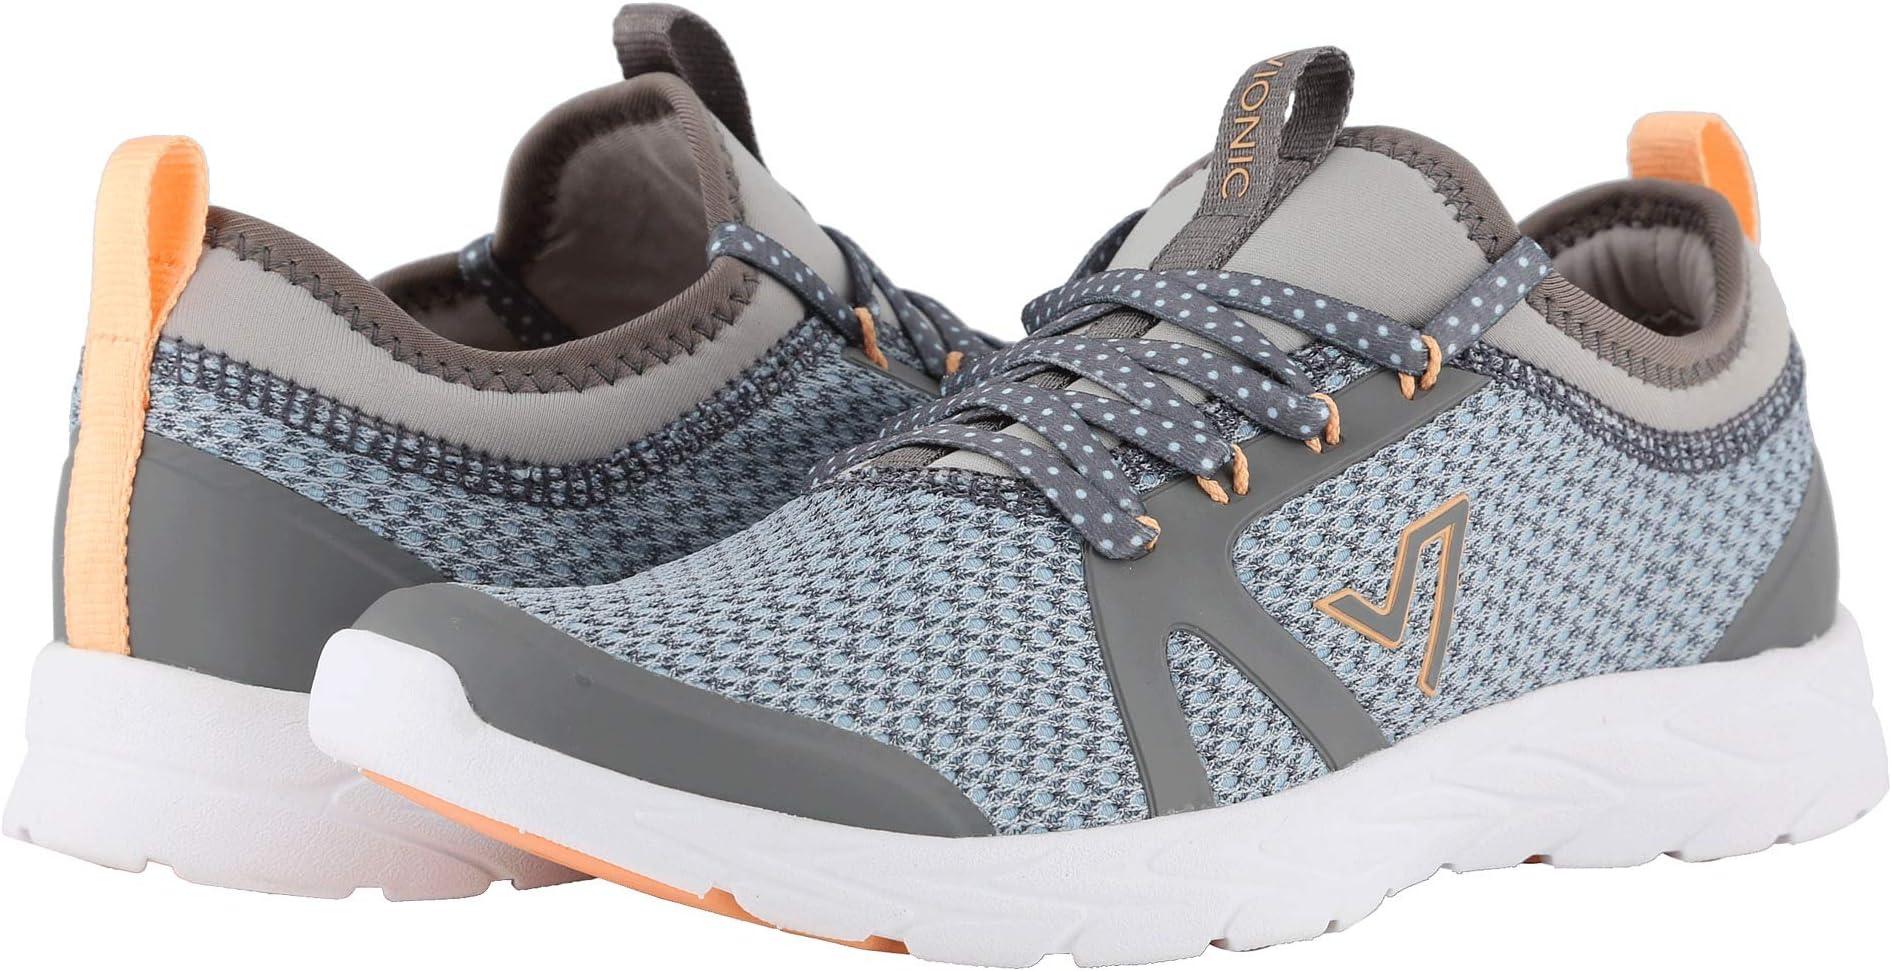 TC-4-Sneakers-2019-4-01